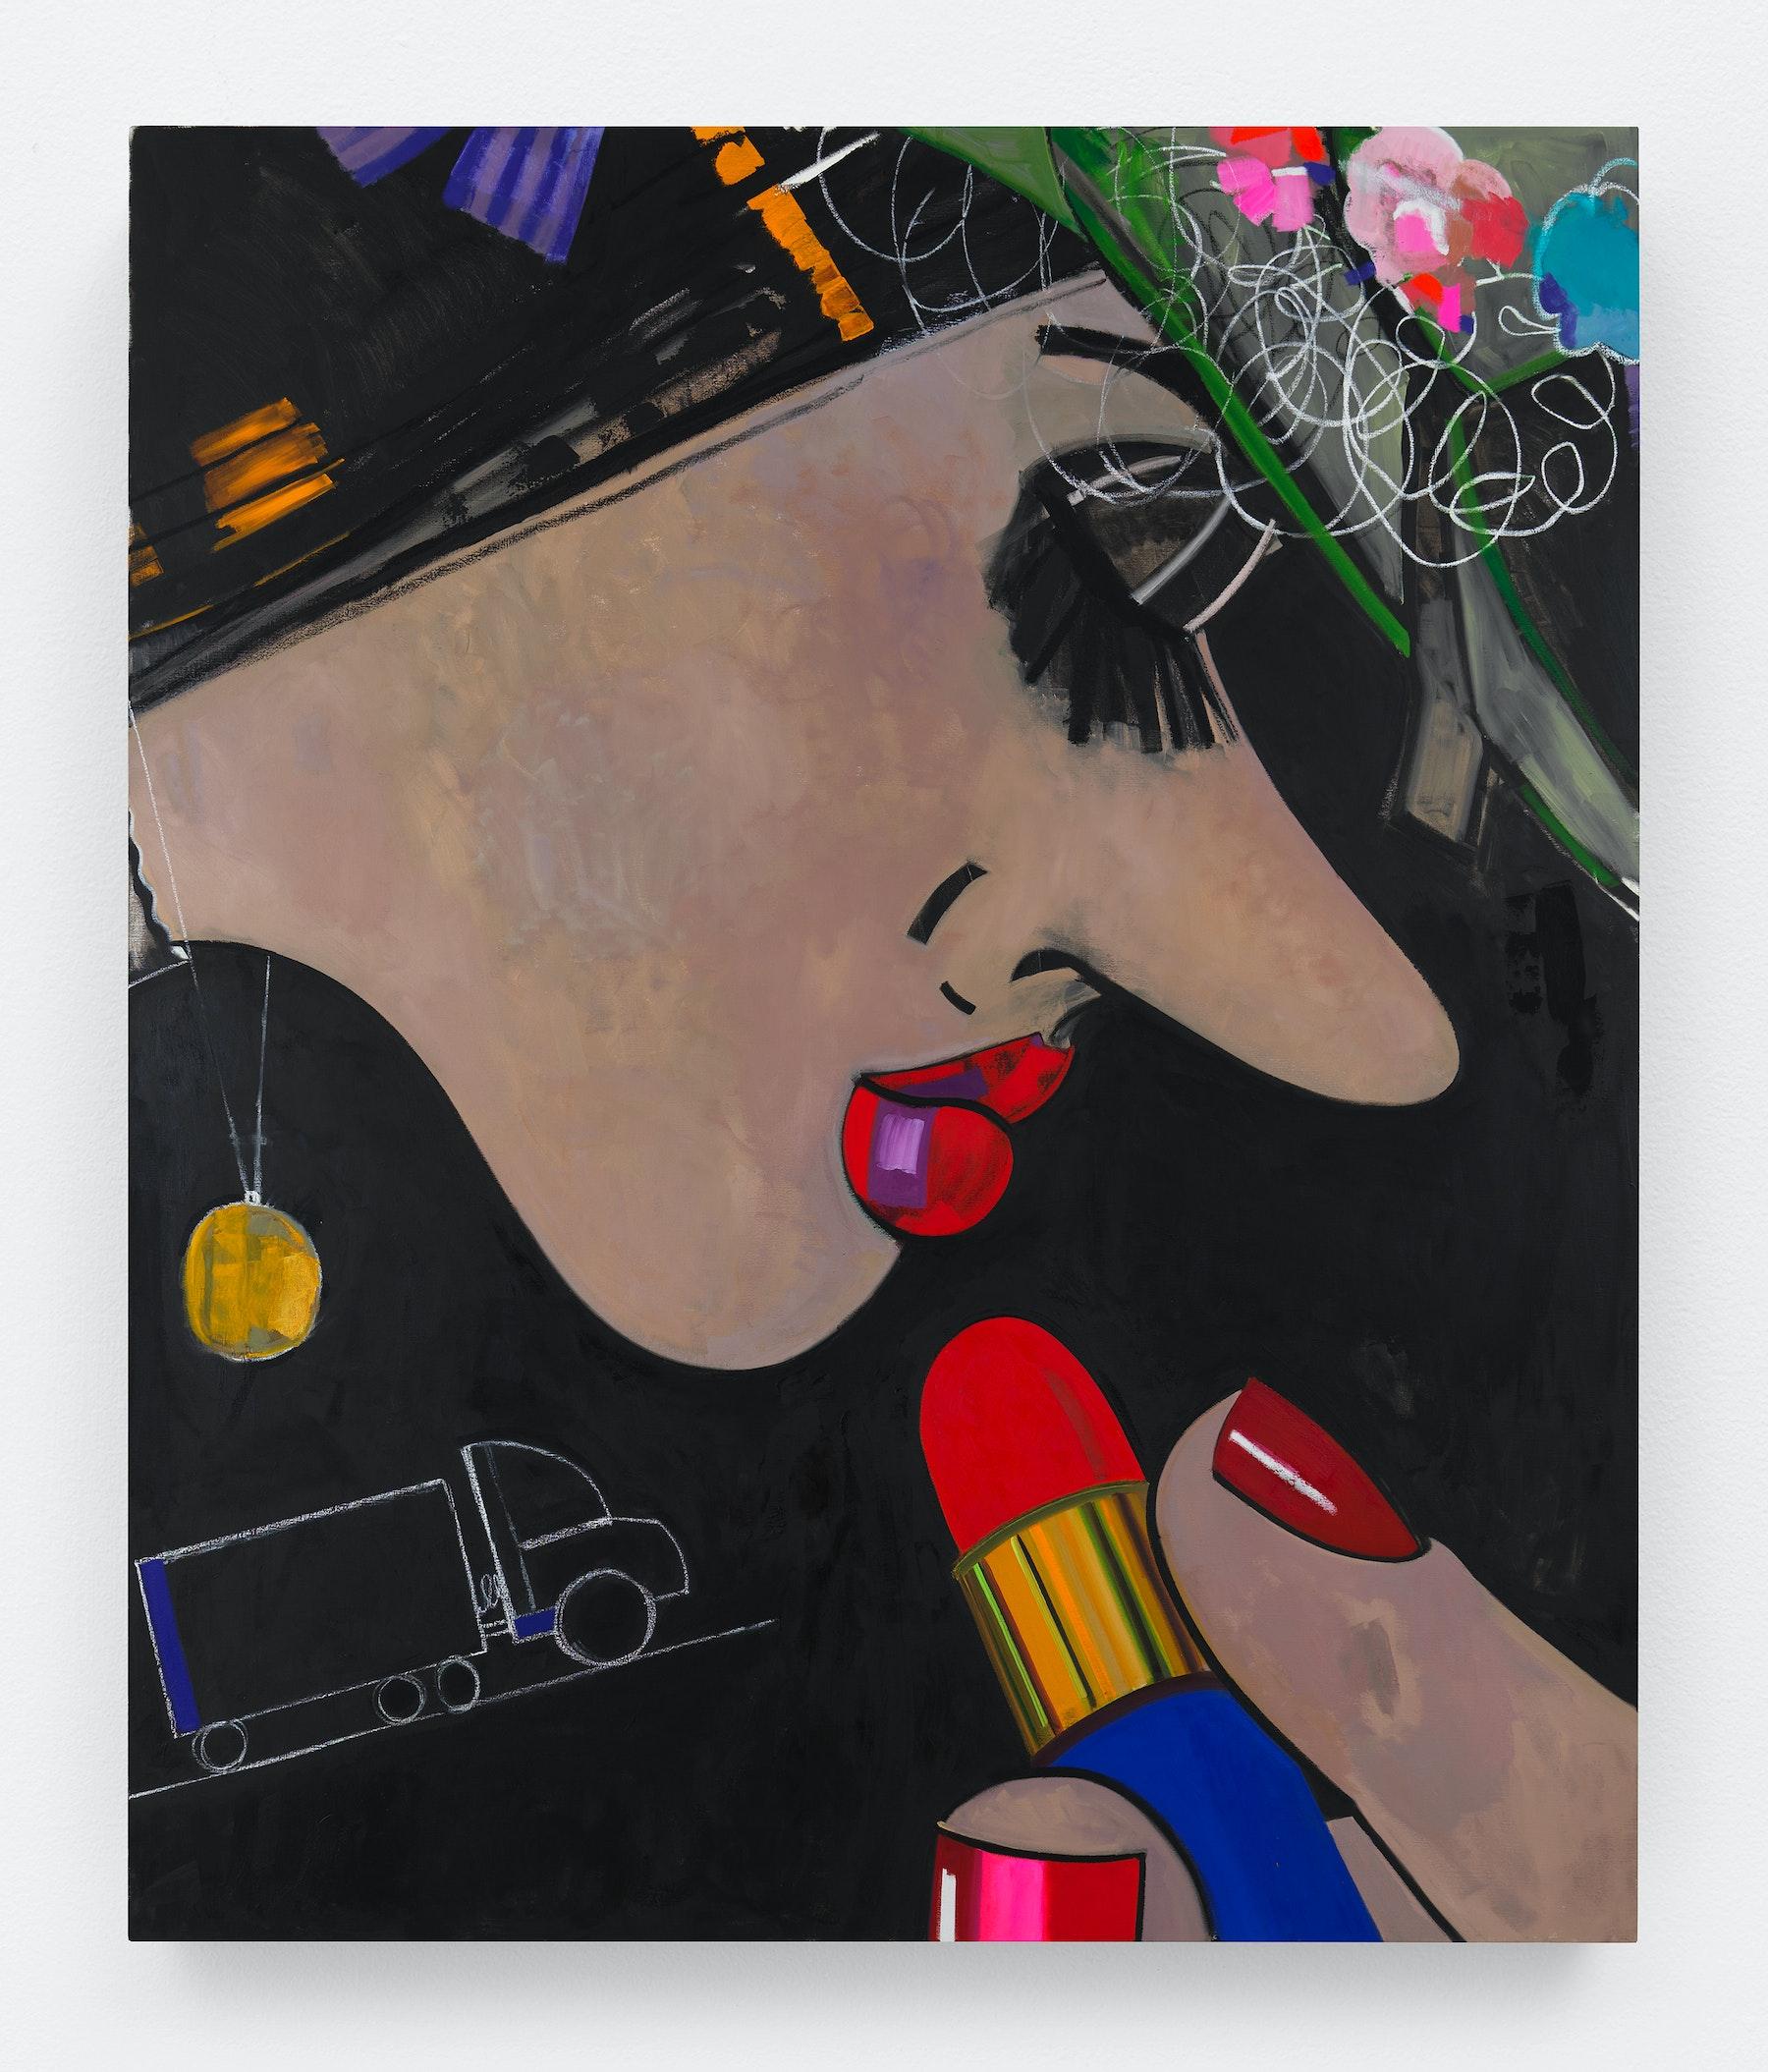 "Ellen Berkenblit ""Wildflower Hat,"" 2018 Oil and paintstick on linen 91 x 76"" [HxW] (231.14 x 193.04 cm) Inventory #BER187 Courtesy of the artist and Vielmetter Los Angeles Photo credit: Object Studies"